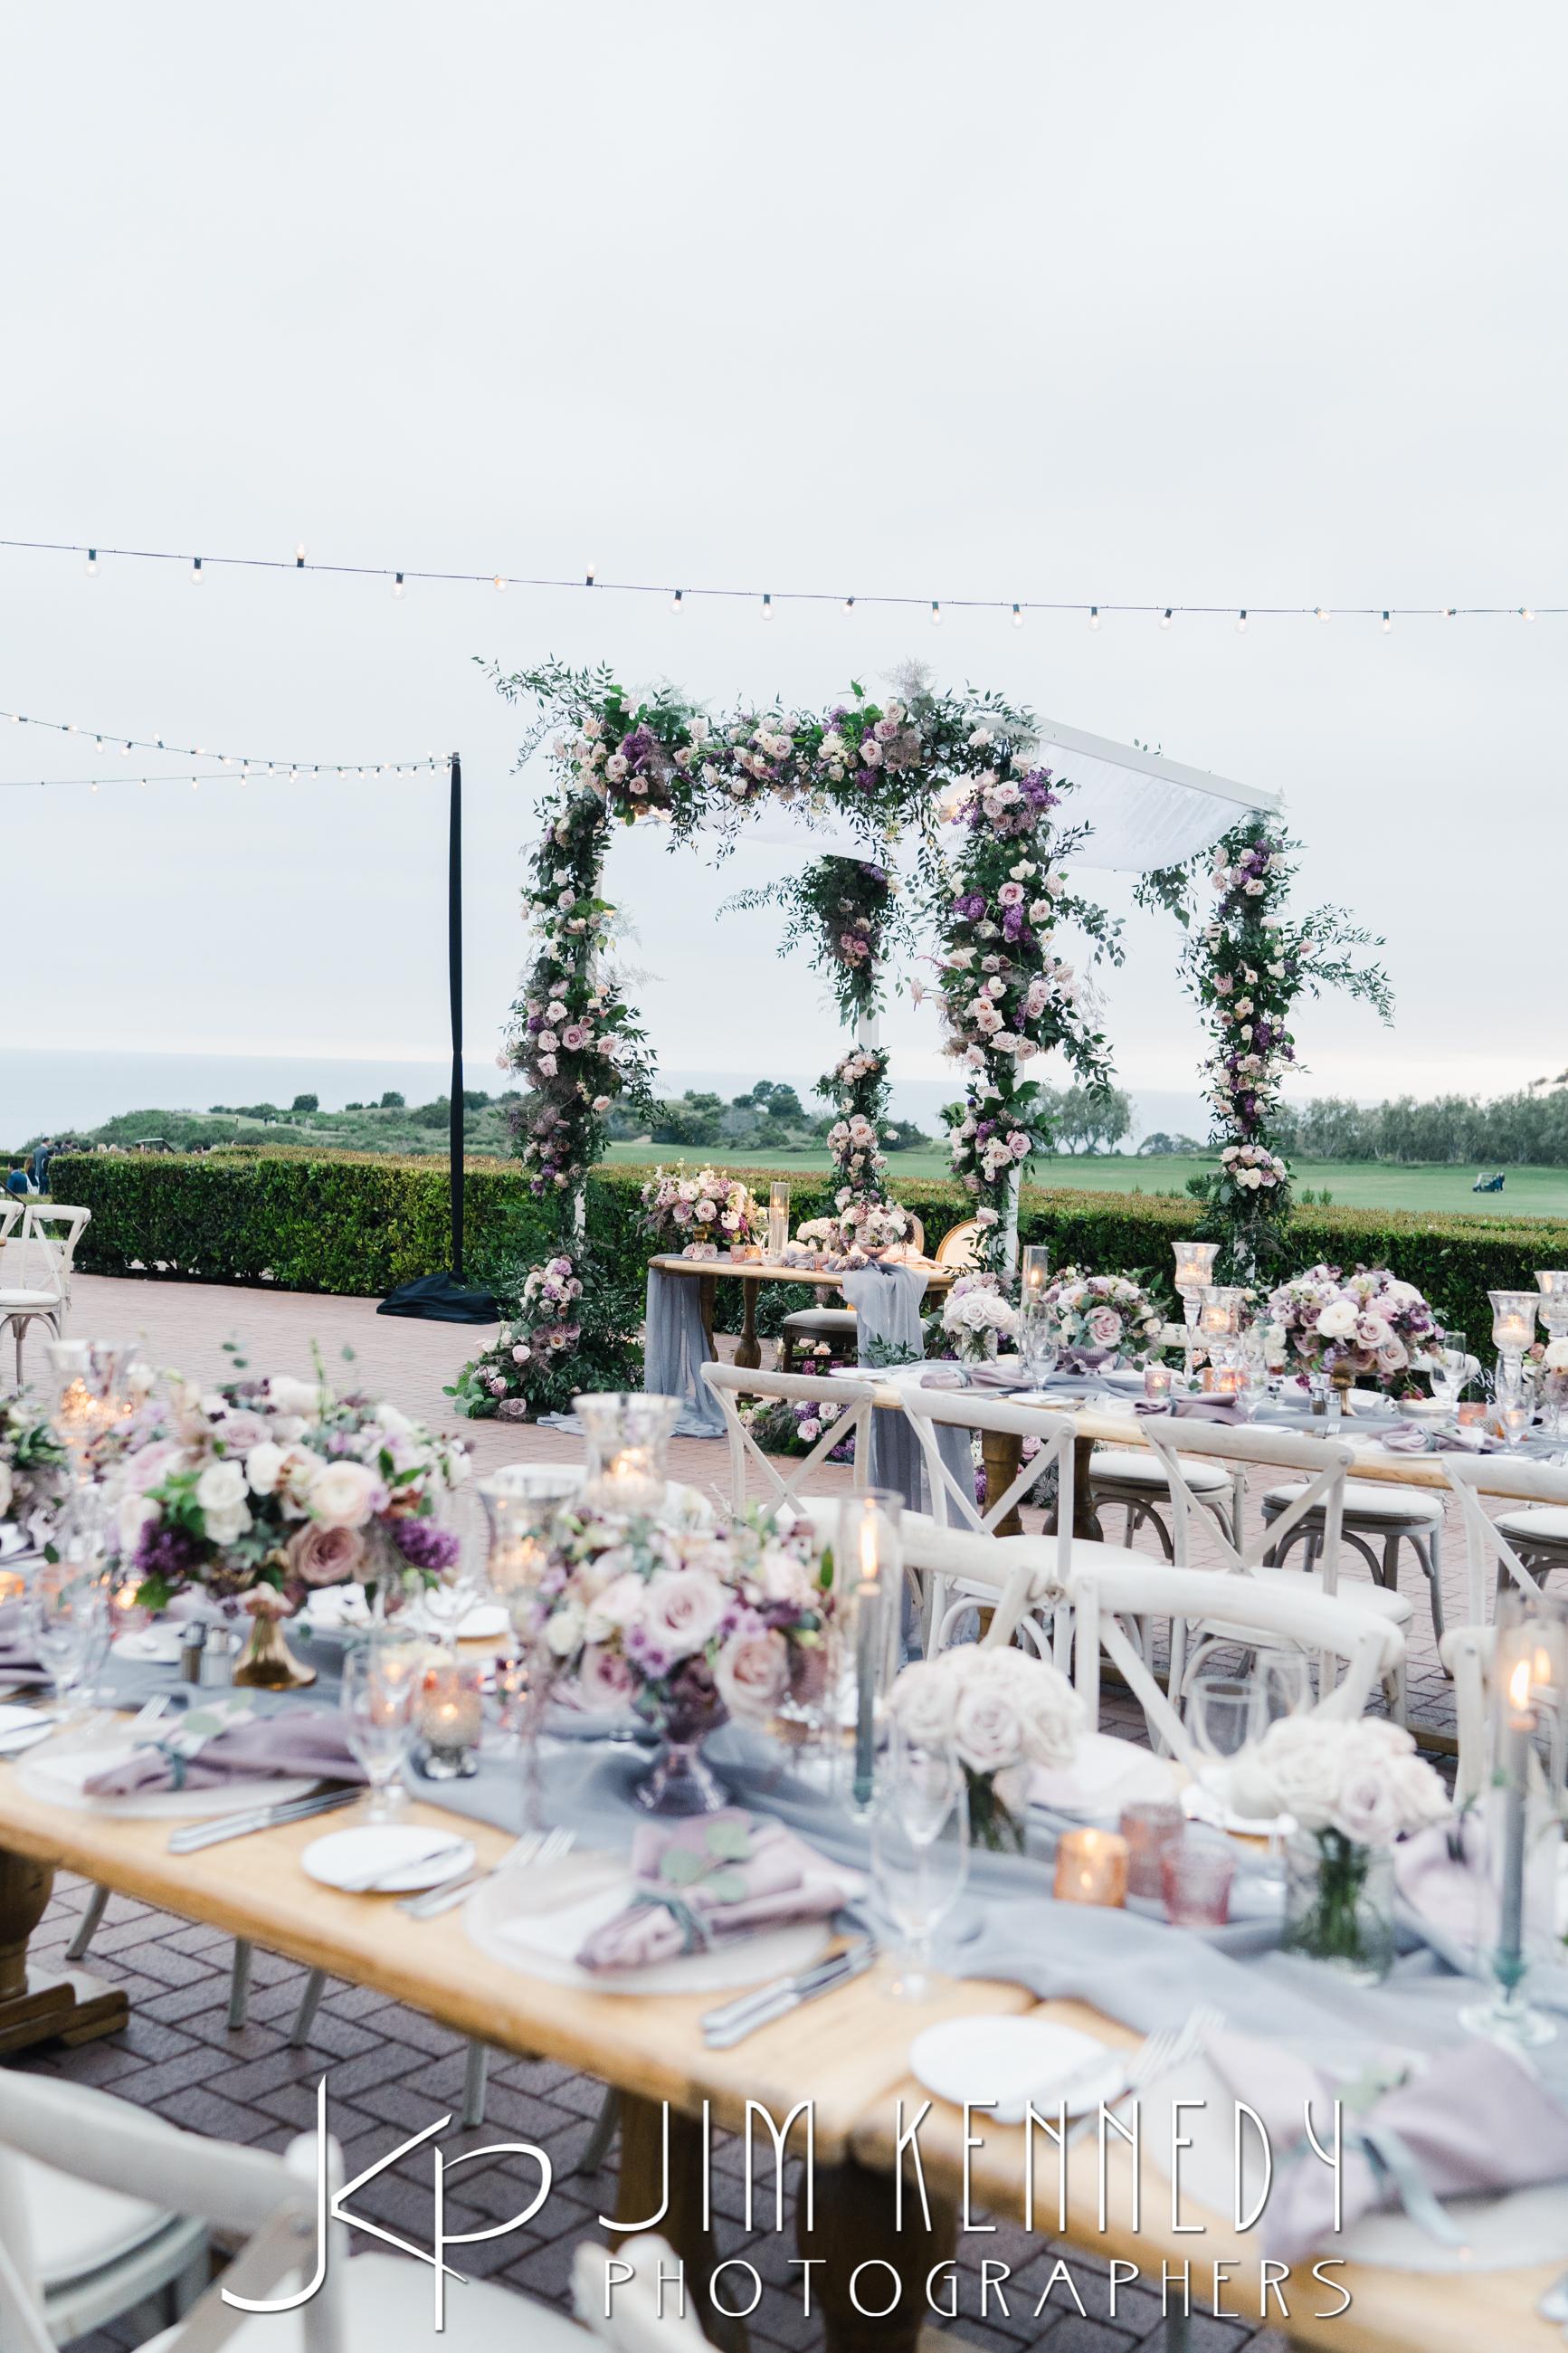 pelican-hill-wedding-jim-kenedy-photographers_0205.JPG